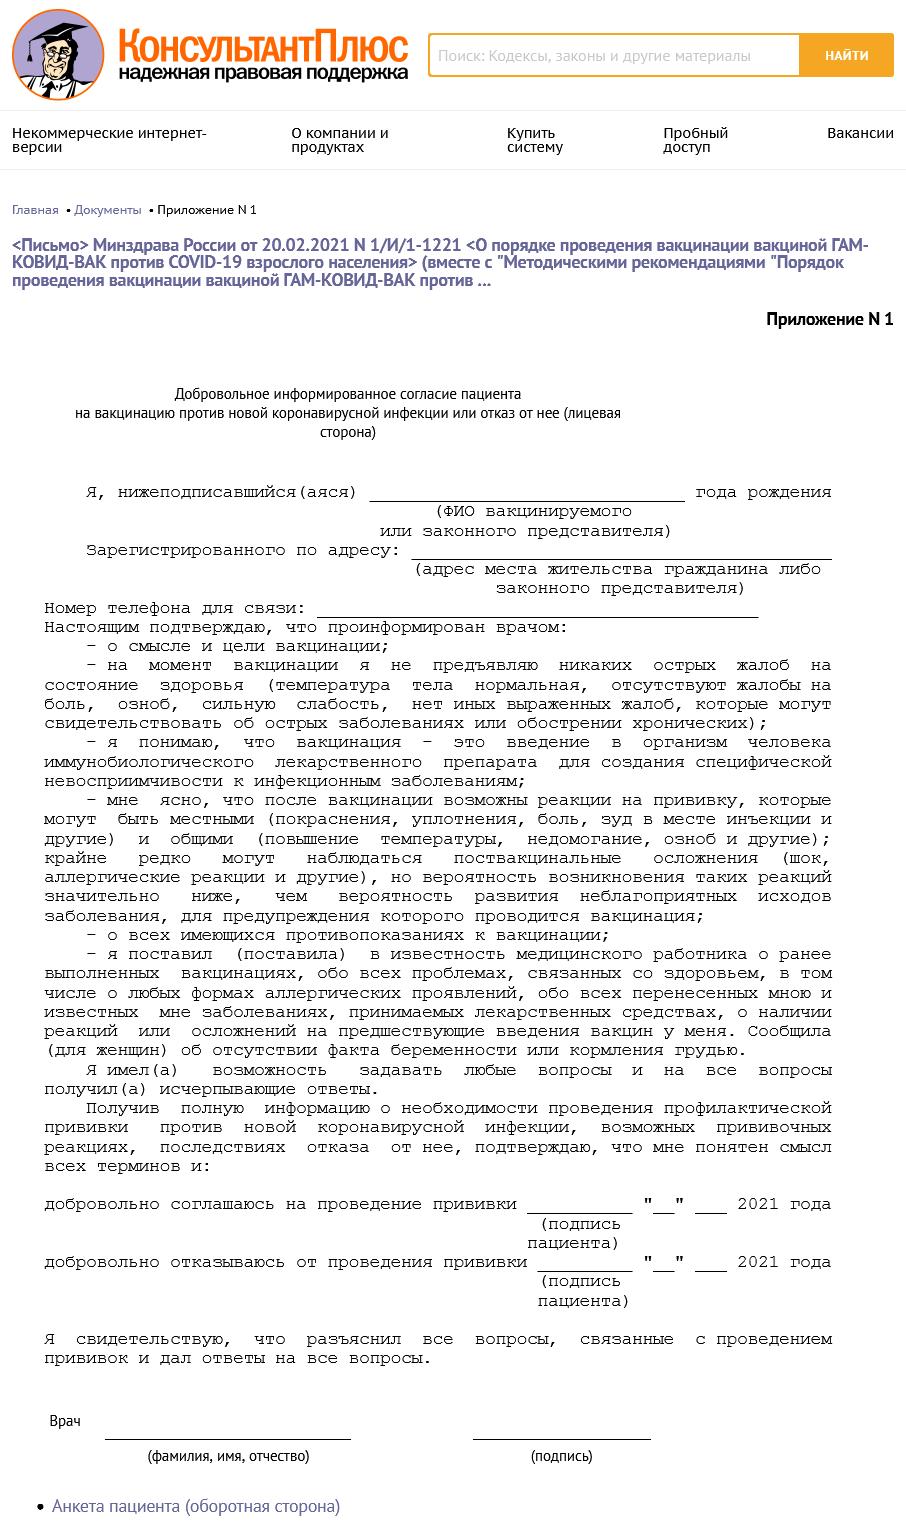 FS-20211018_13-49-n01100-Приложение N 1 _ КонсультантПлюс-www.consultant.ru